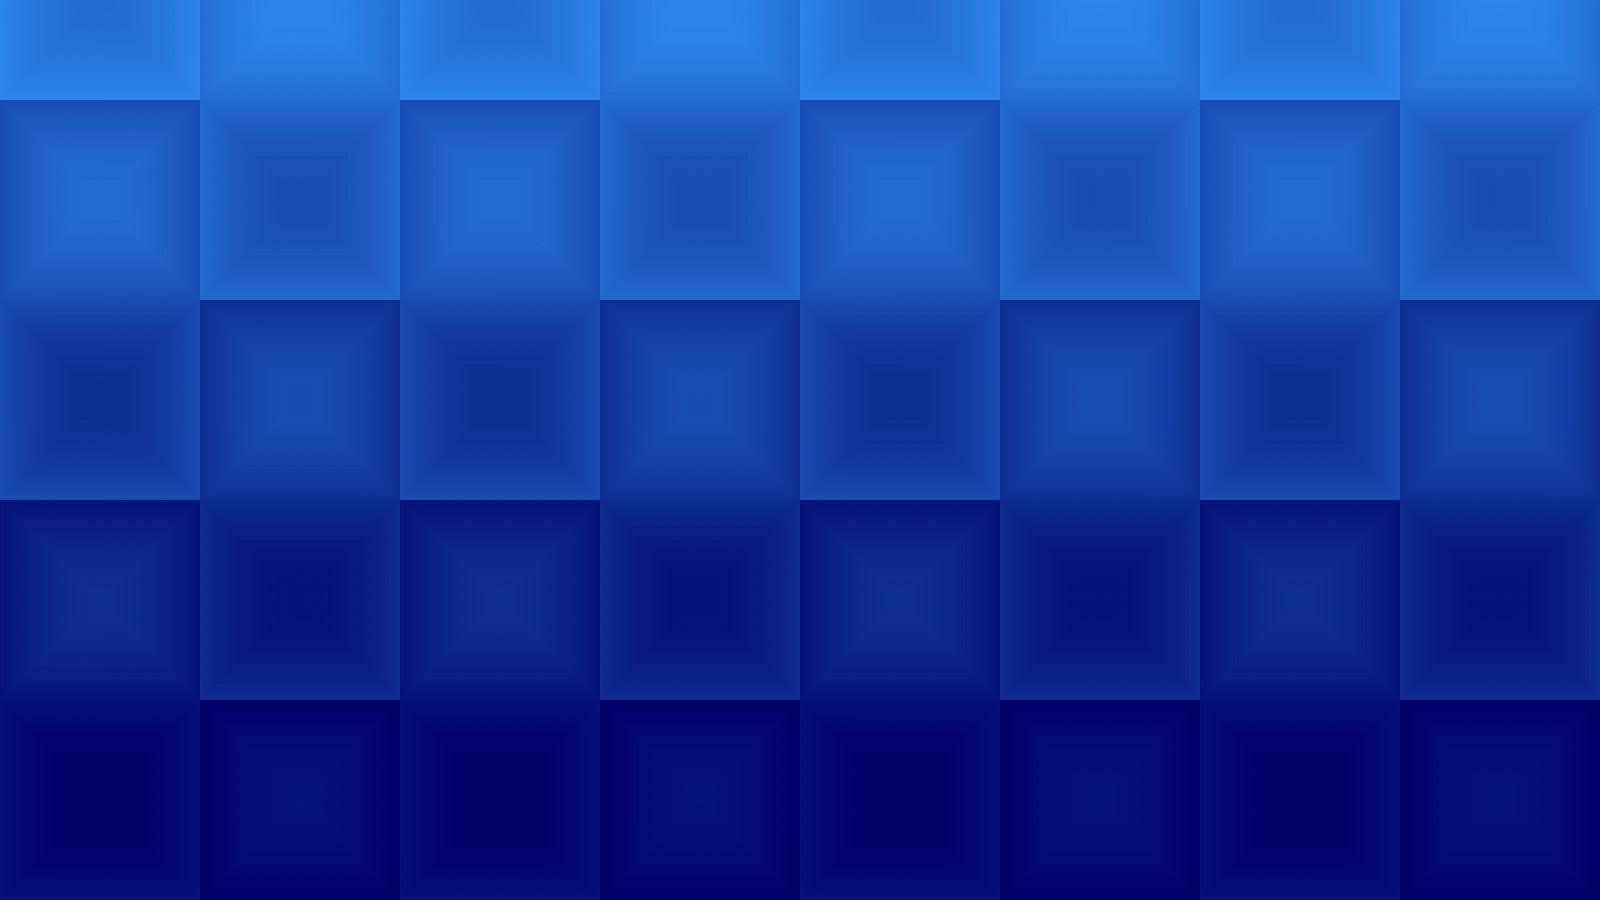 Wallpaper latar belakang biru sederhana minimalis